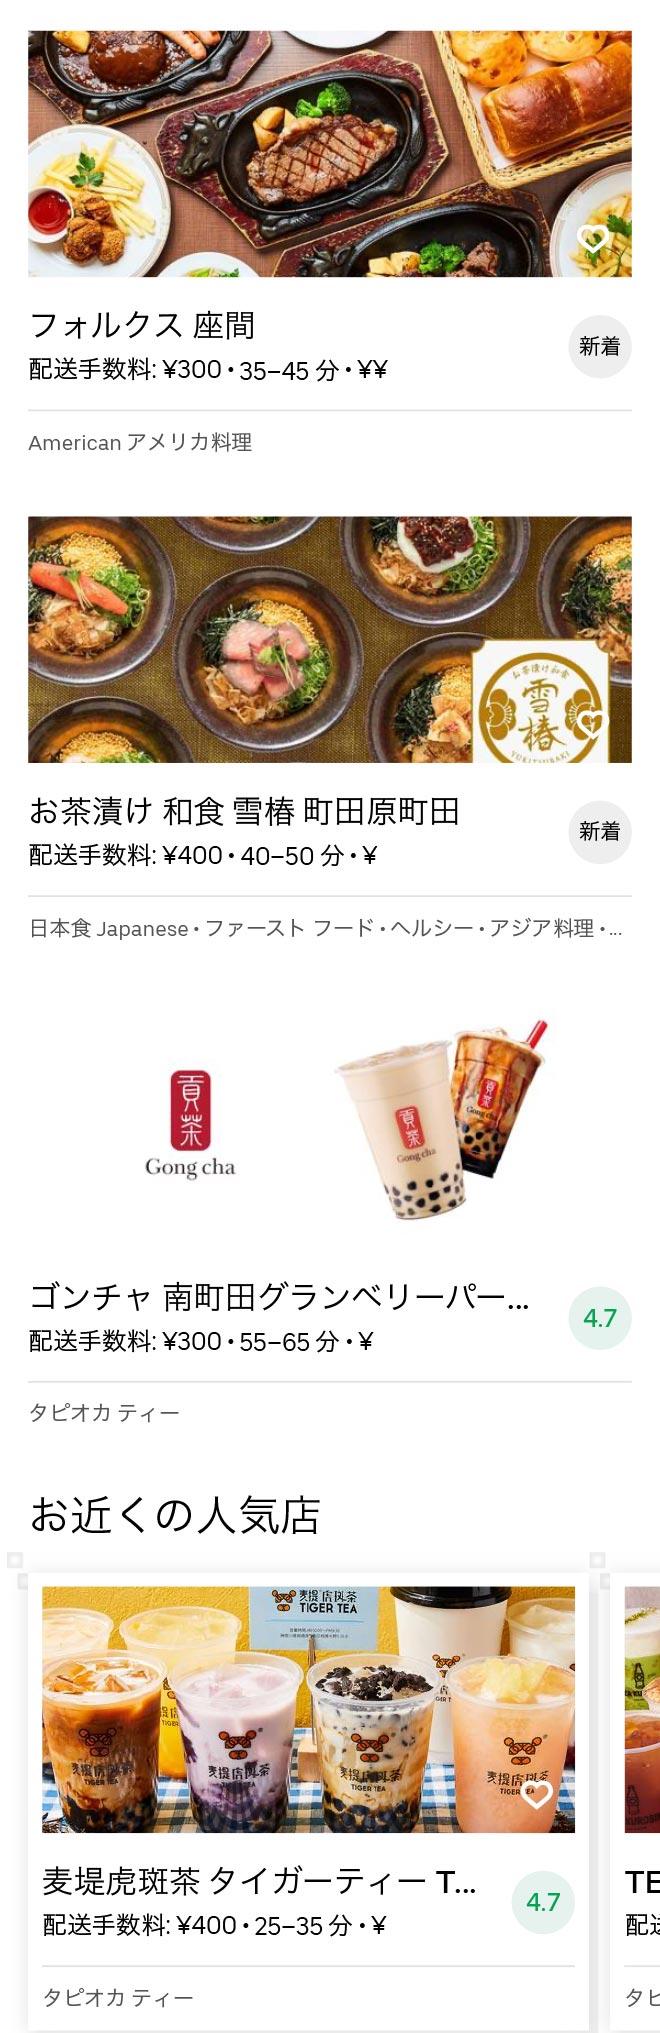 Chuo rinkan menu 2008 01